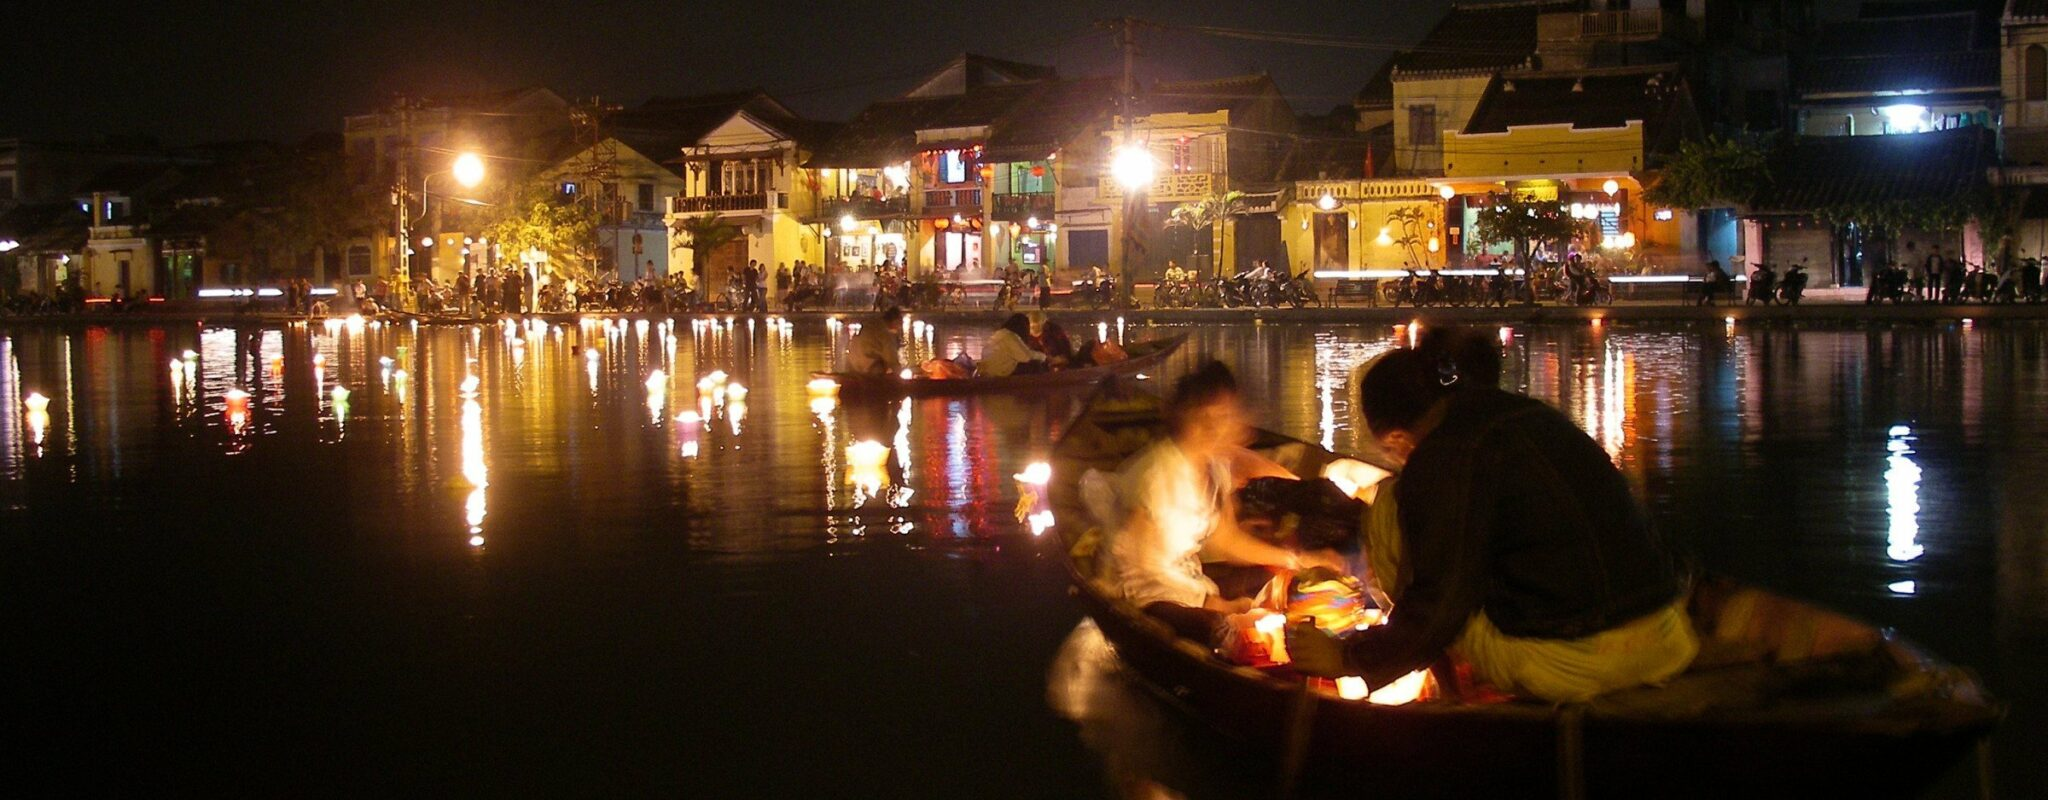 Hoi An Lantern Festival 2016 Dates Insidevietnam Blog